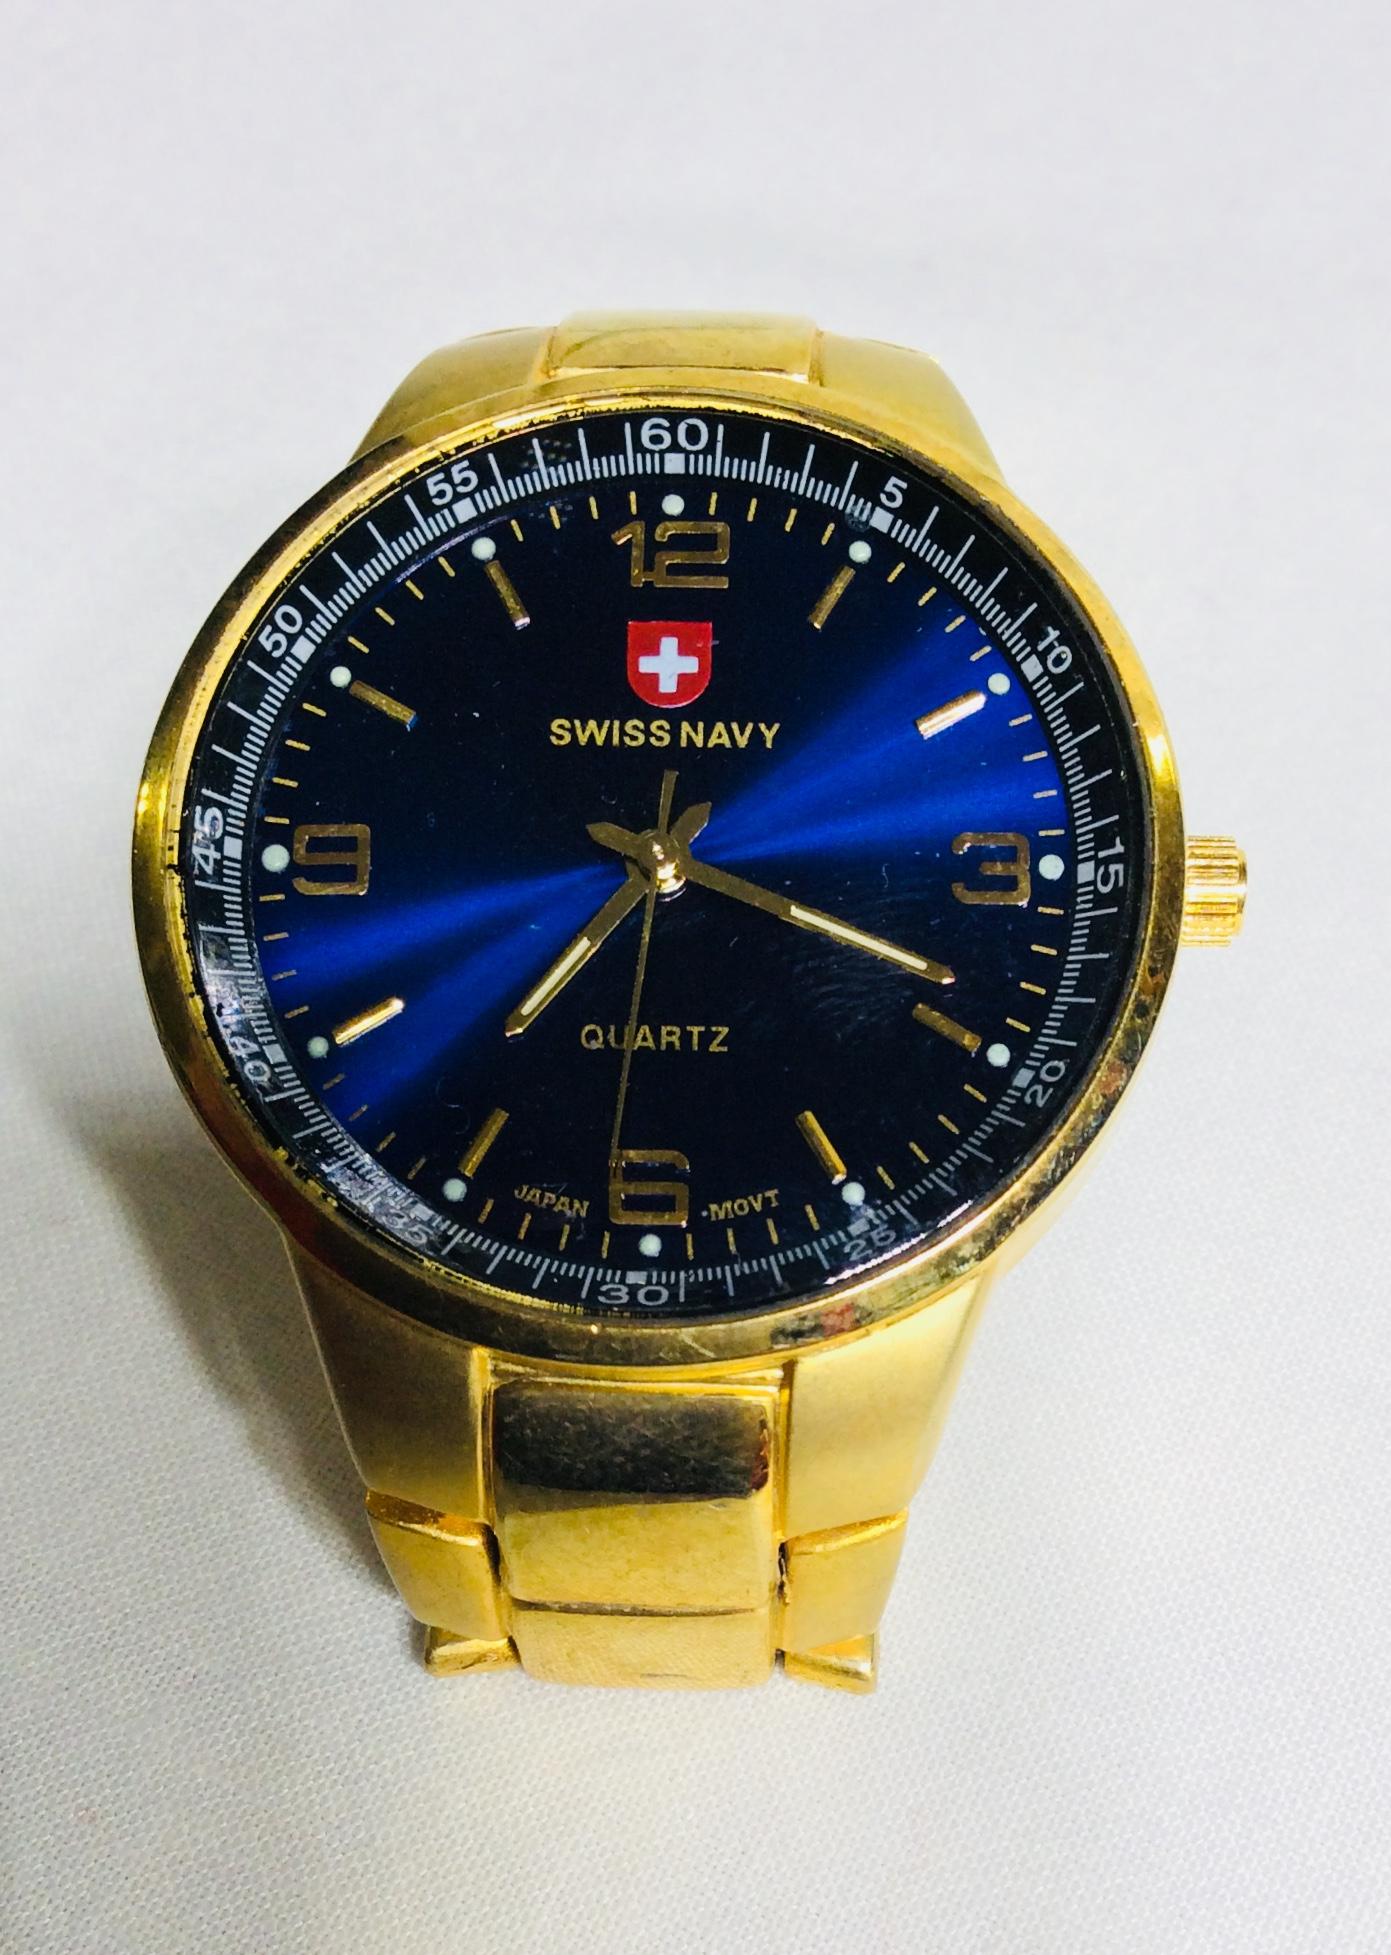 Swiss Navy Golden Watch